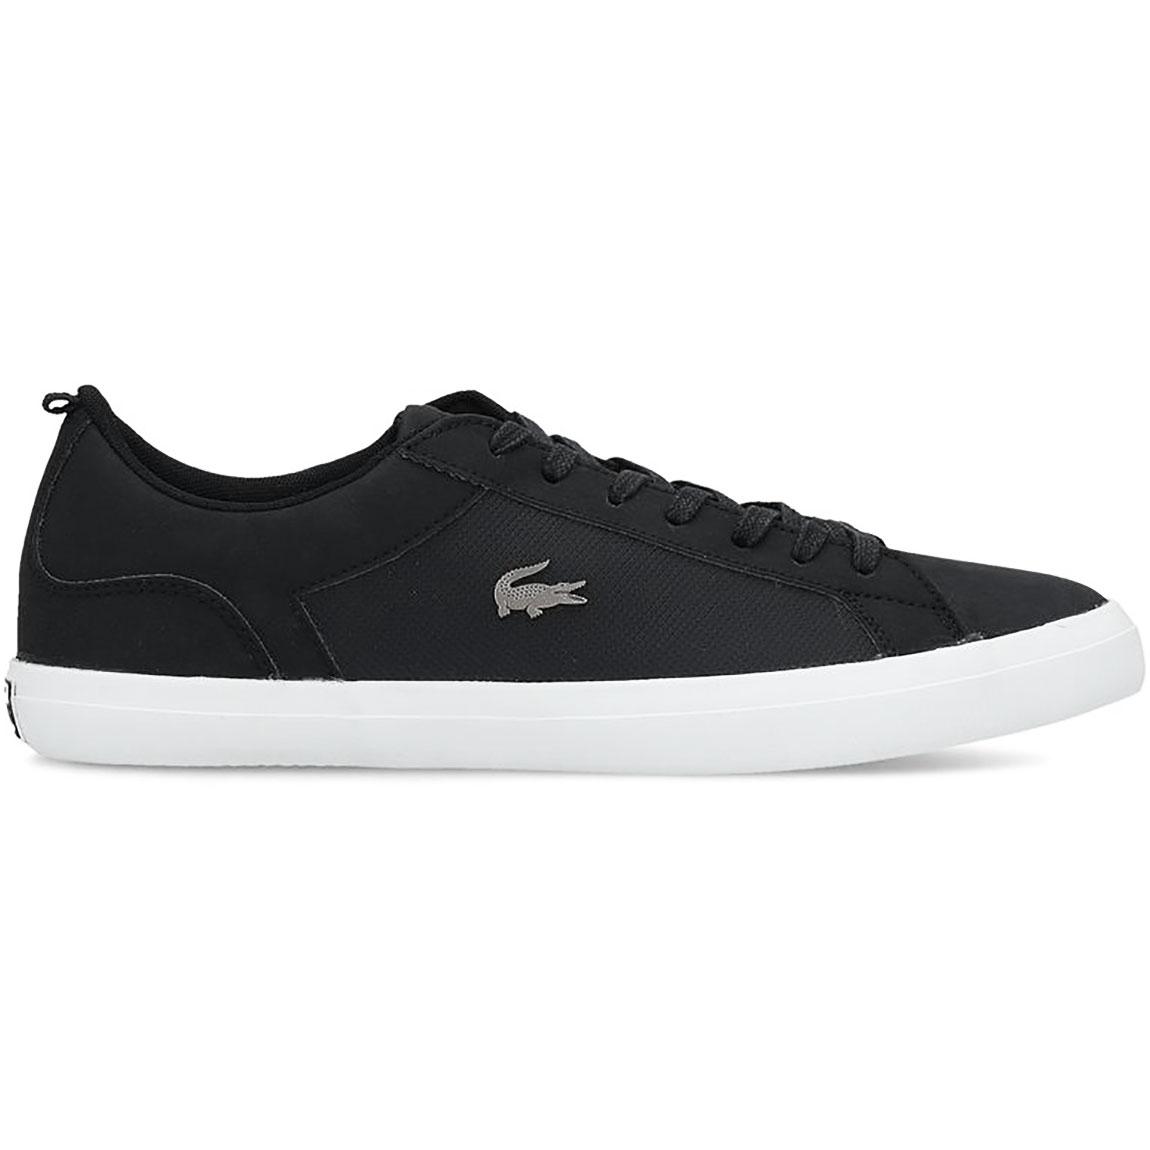 Lacoste Lerond 119 Herren Sneaker schwarz 7-37CMA0046454